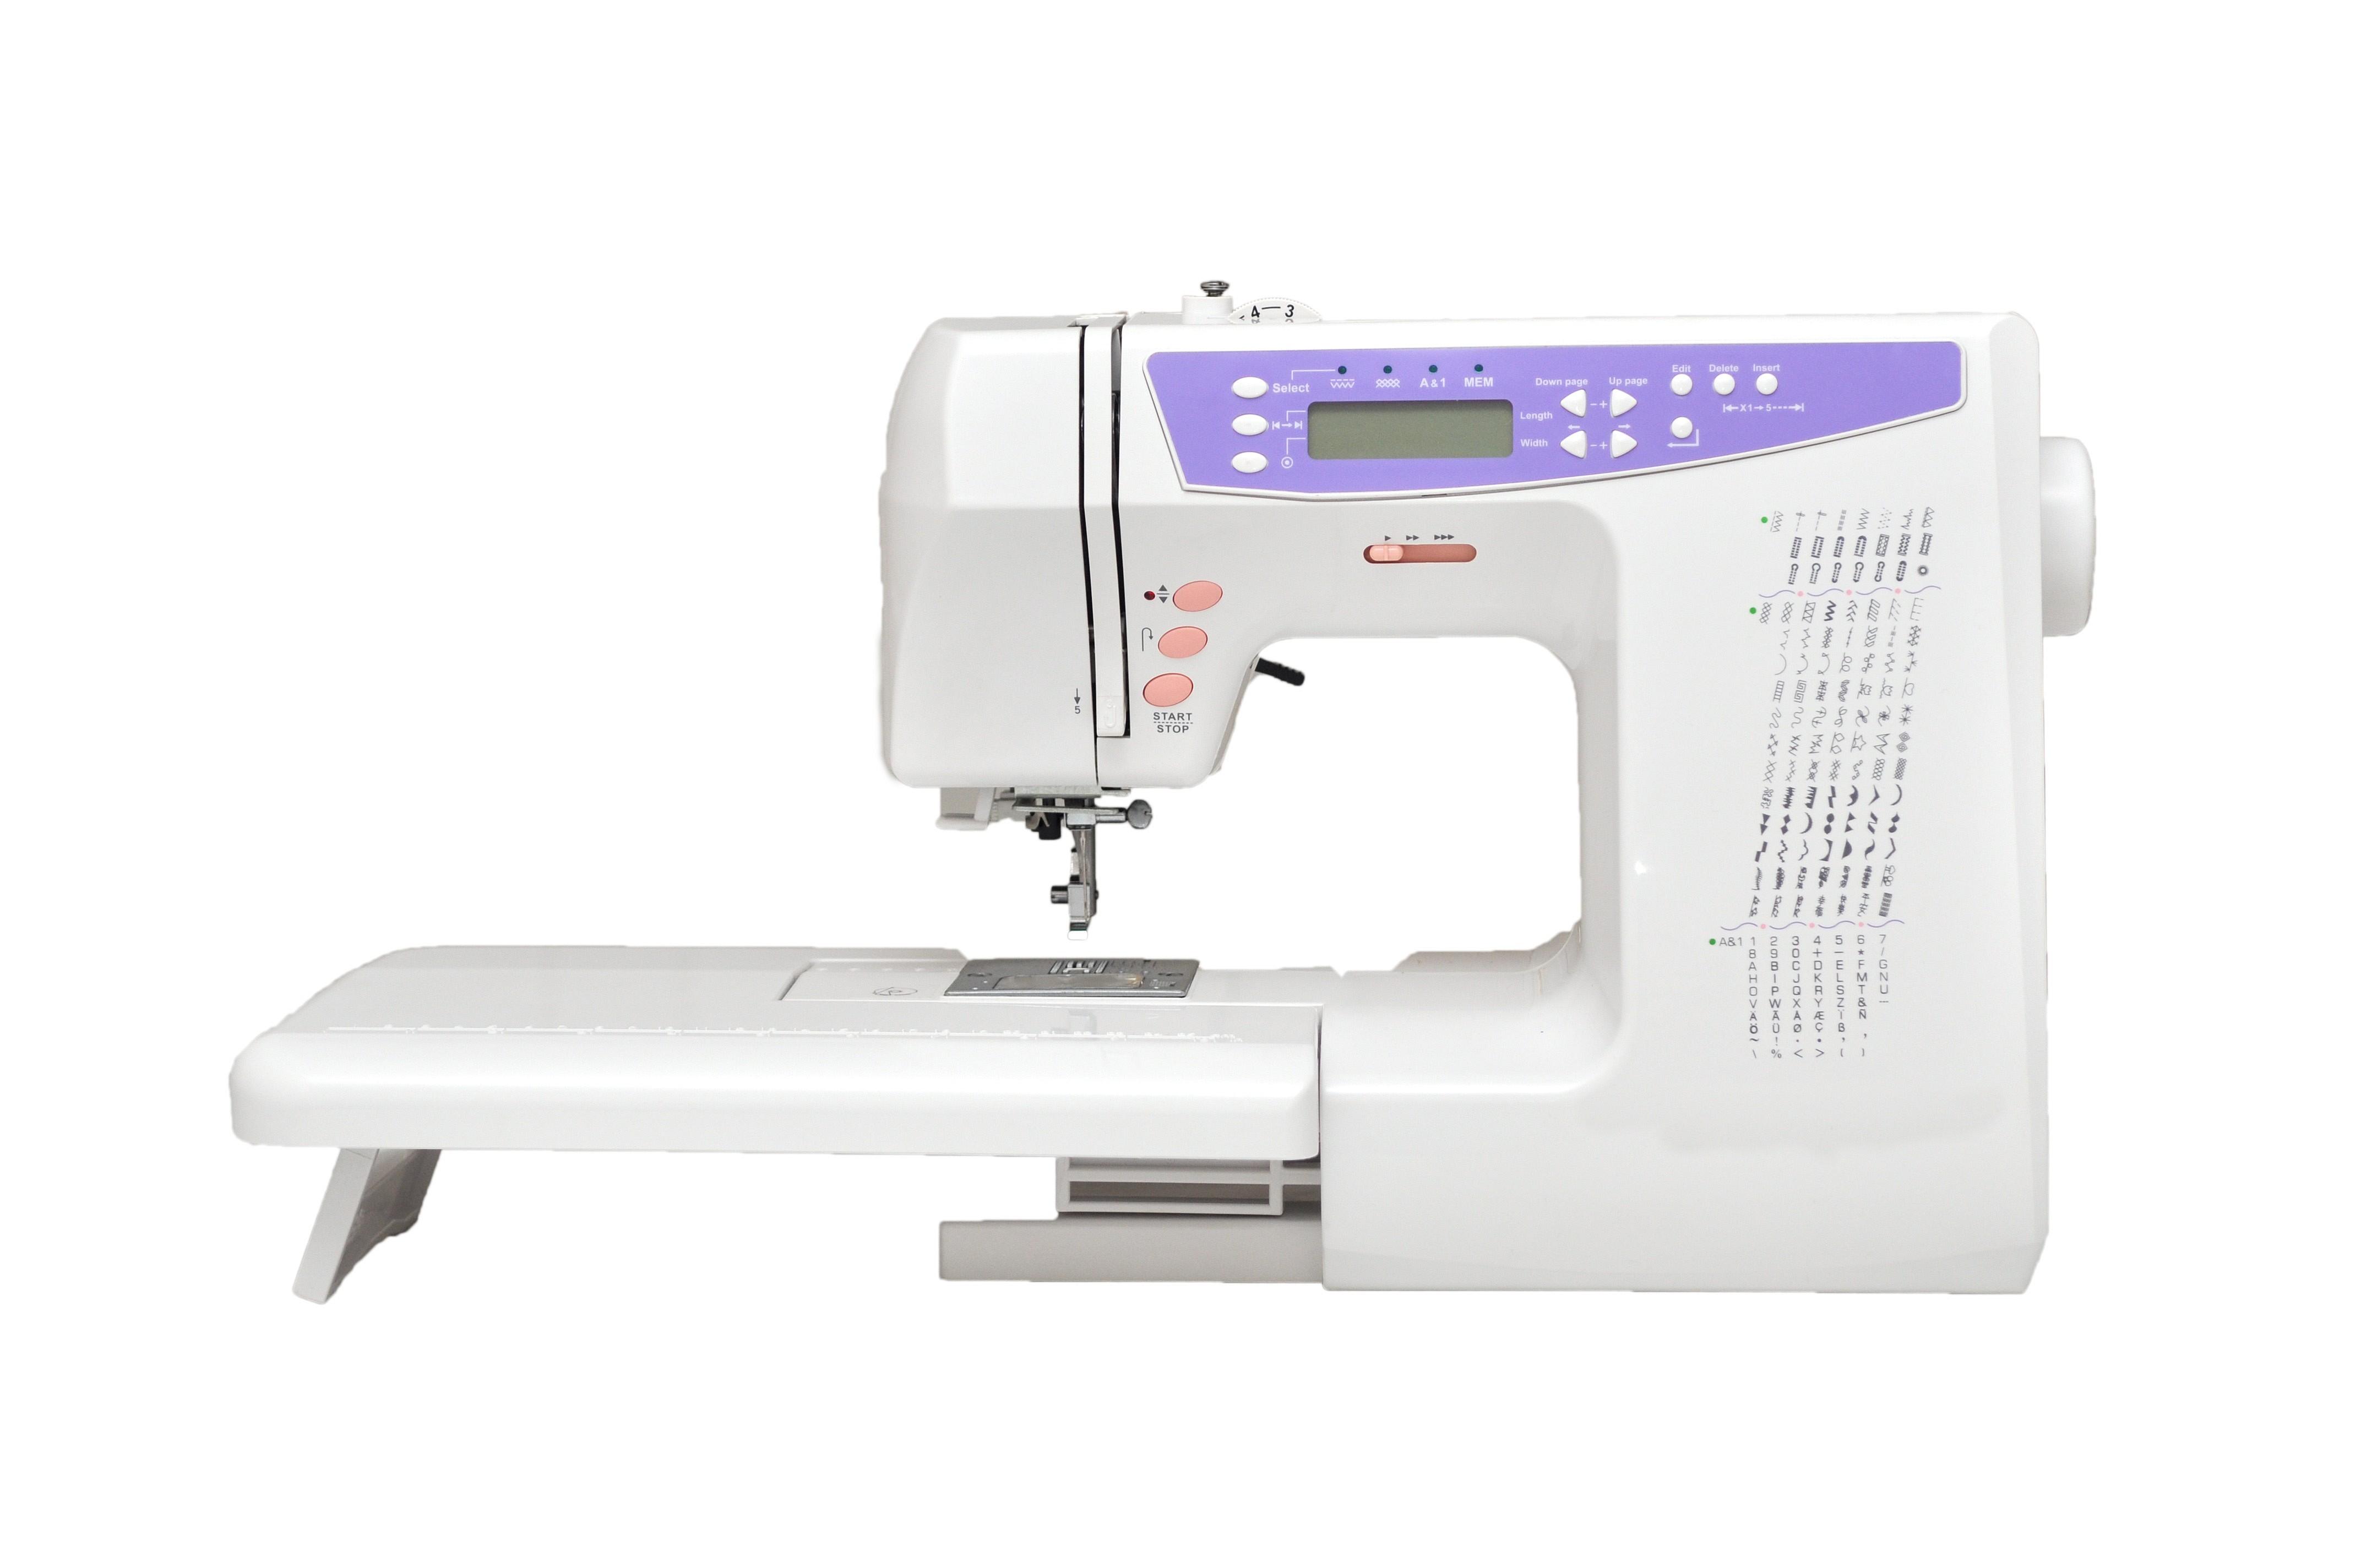 Sewing machine 404 170 stitches alphabet for Decor 99 sewing machine